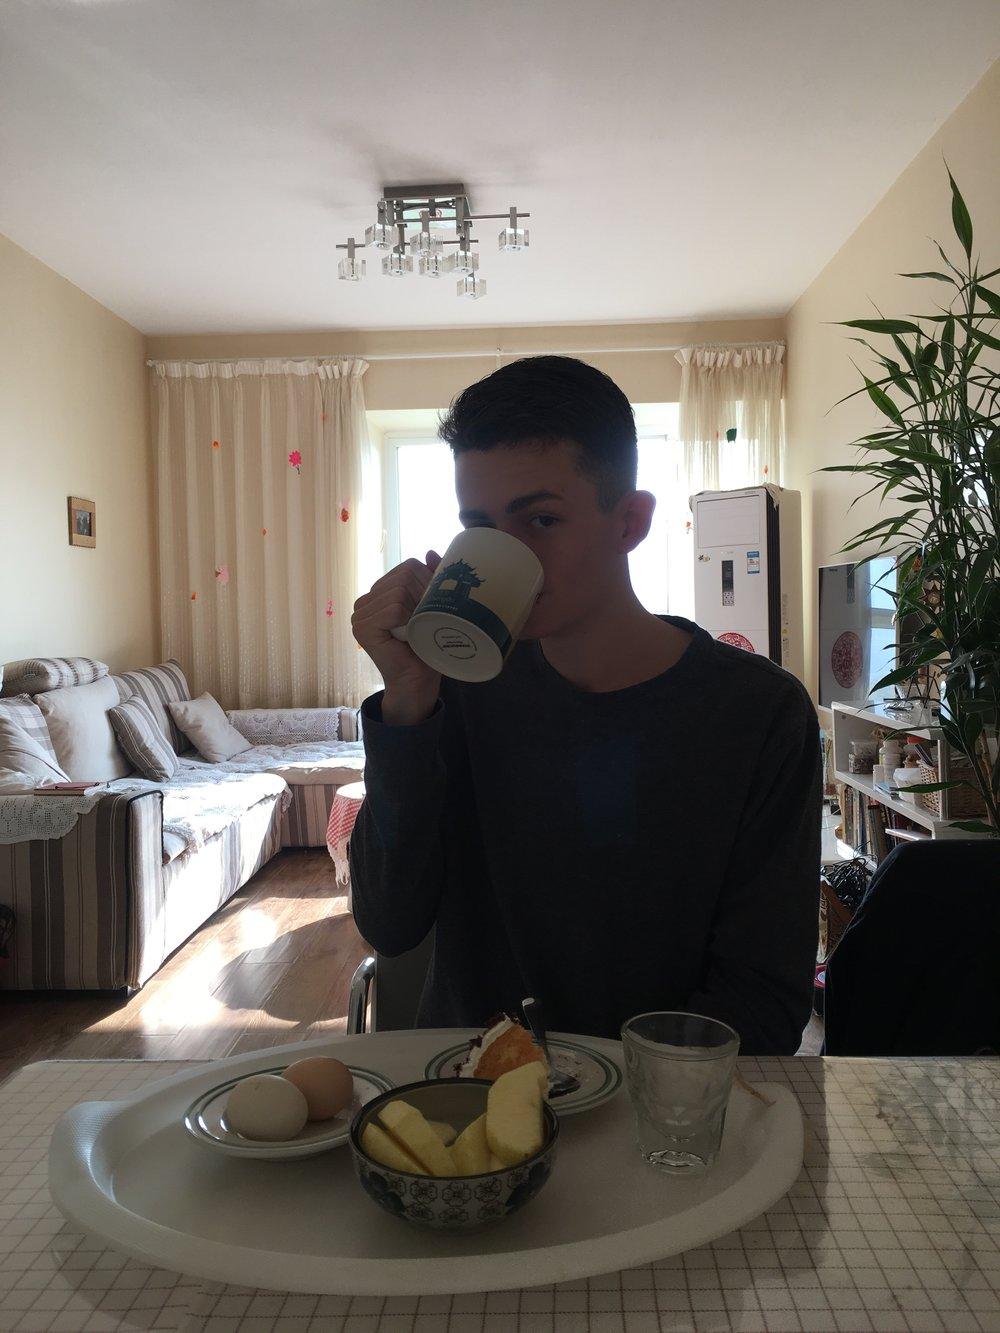 Enjoying breakfast at a friend's house!